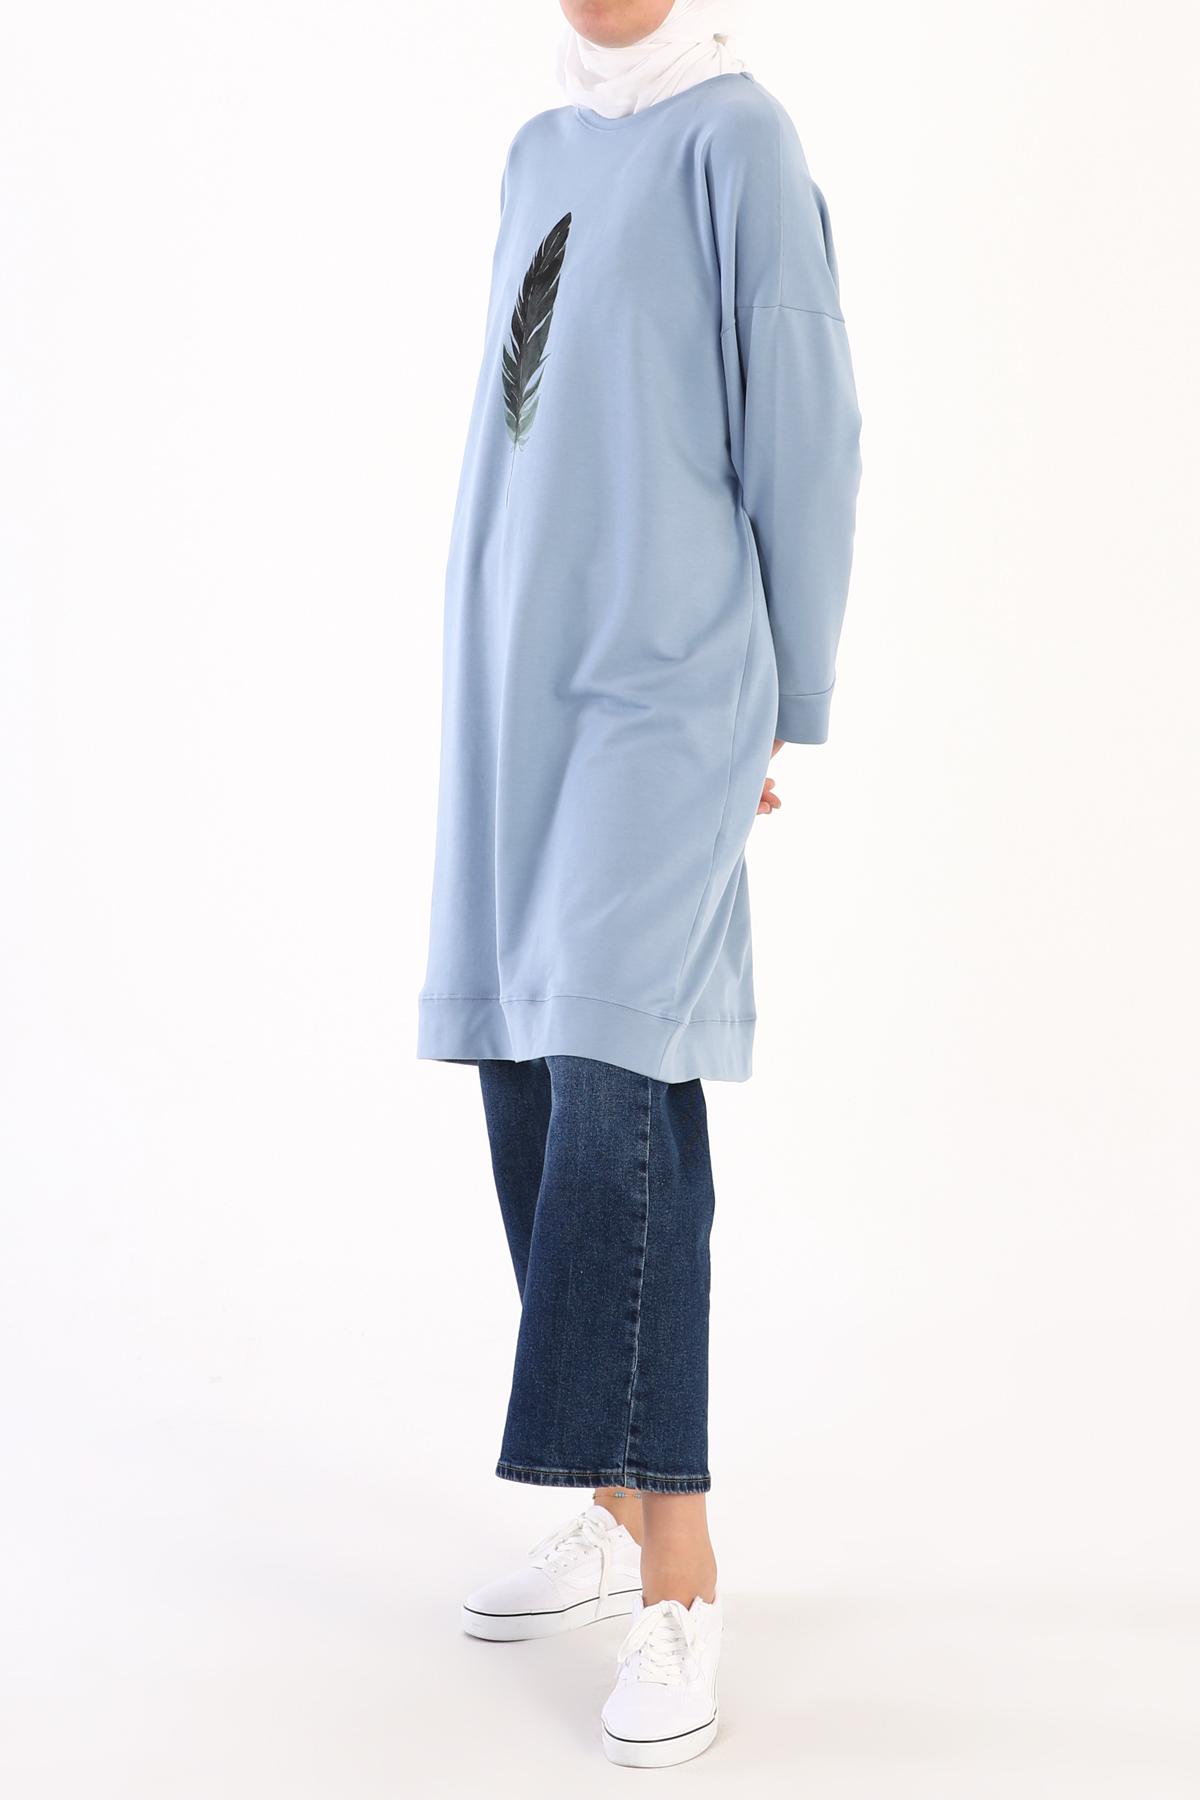 Plus Size Feather Printed Sweatshirt Tunic